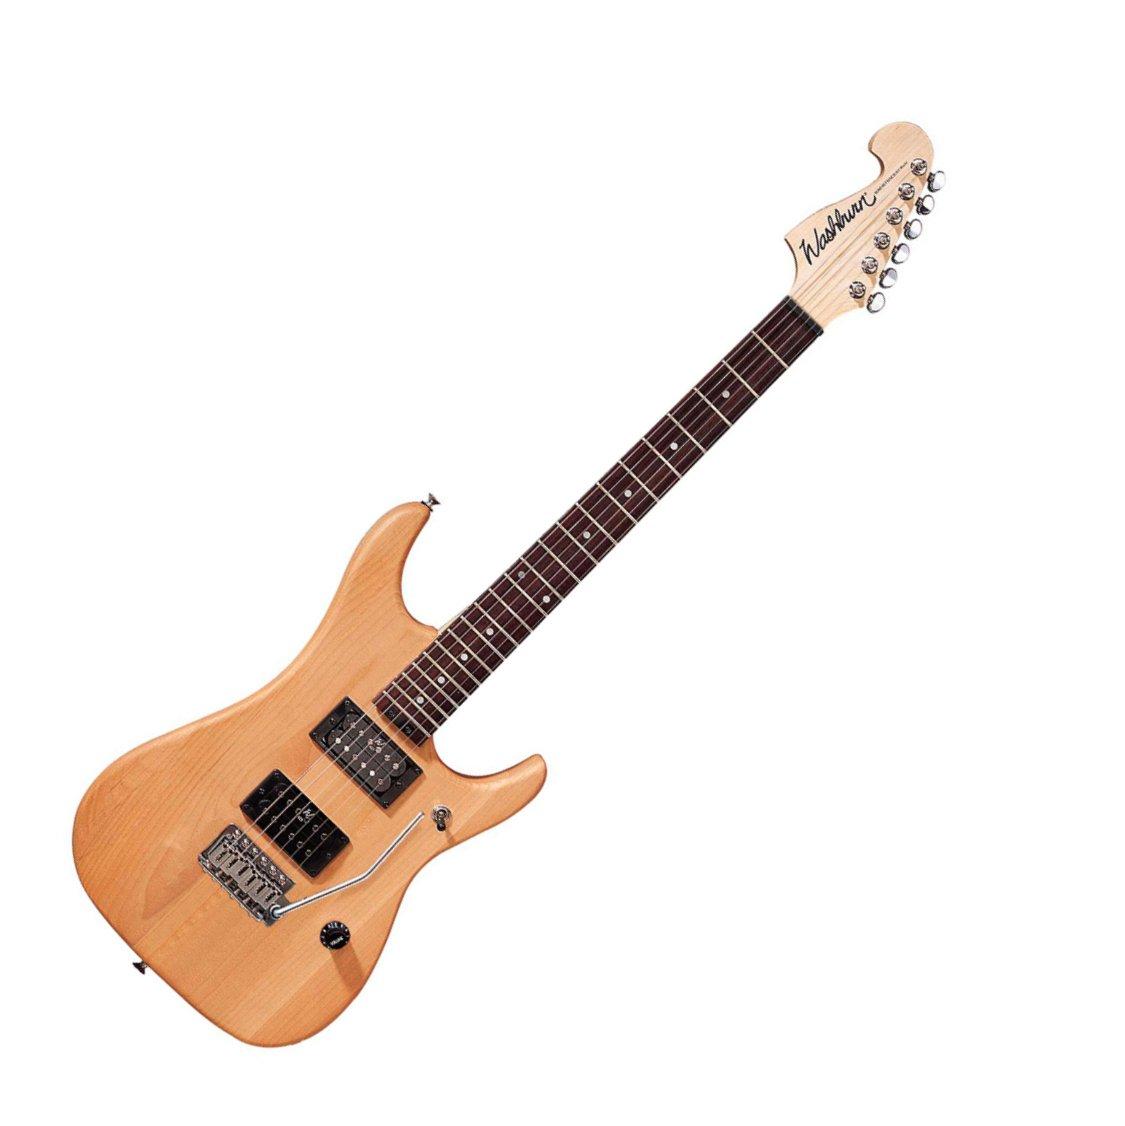 Guitarra Washburn N1Nm Nuno Bettencourt